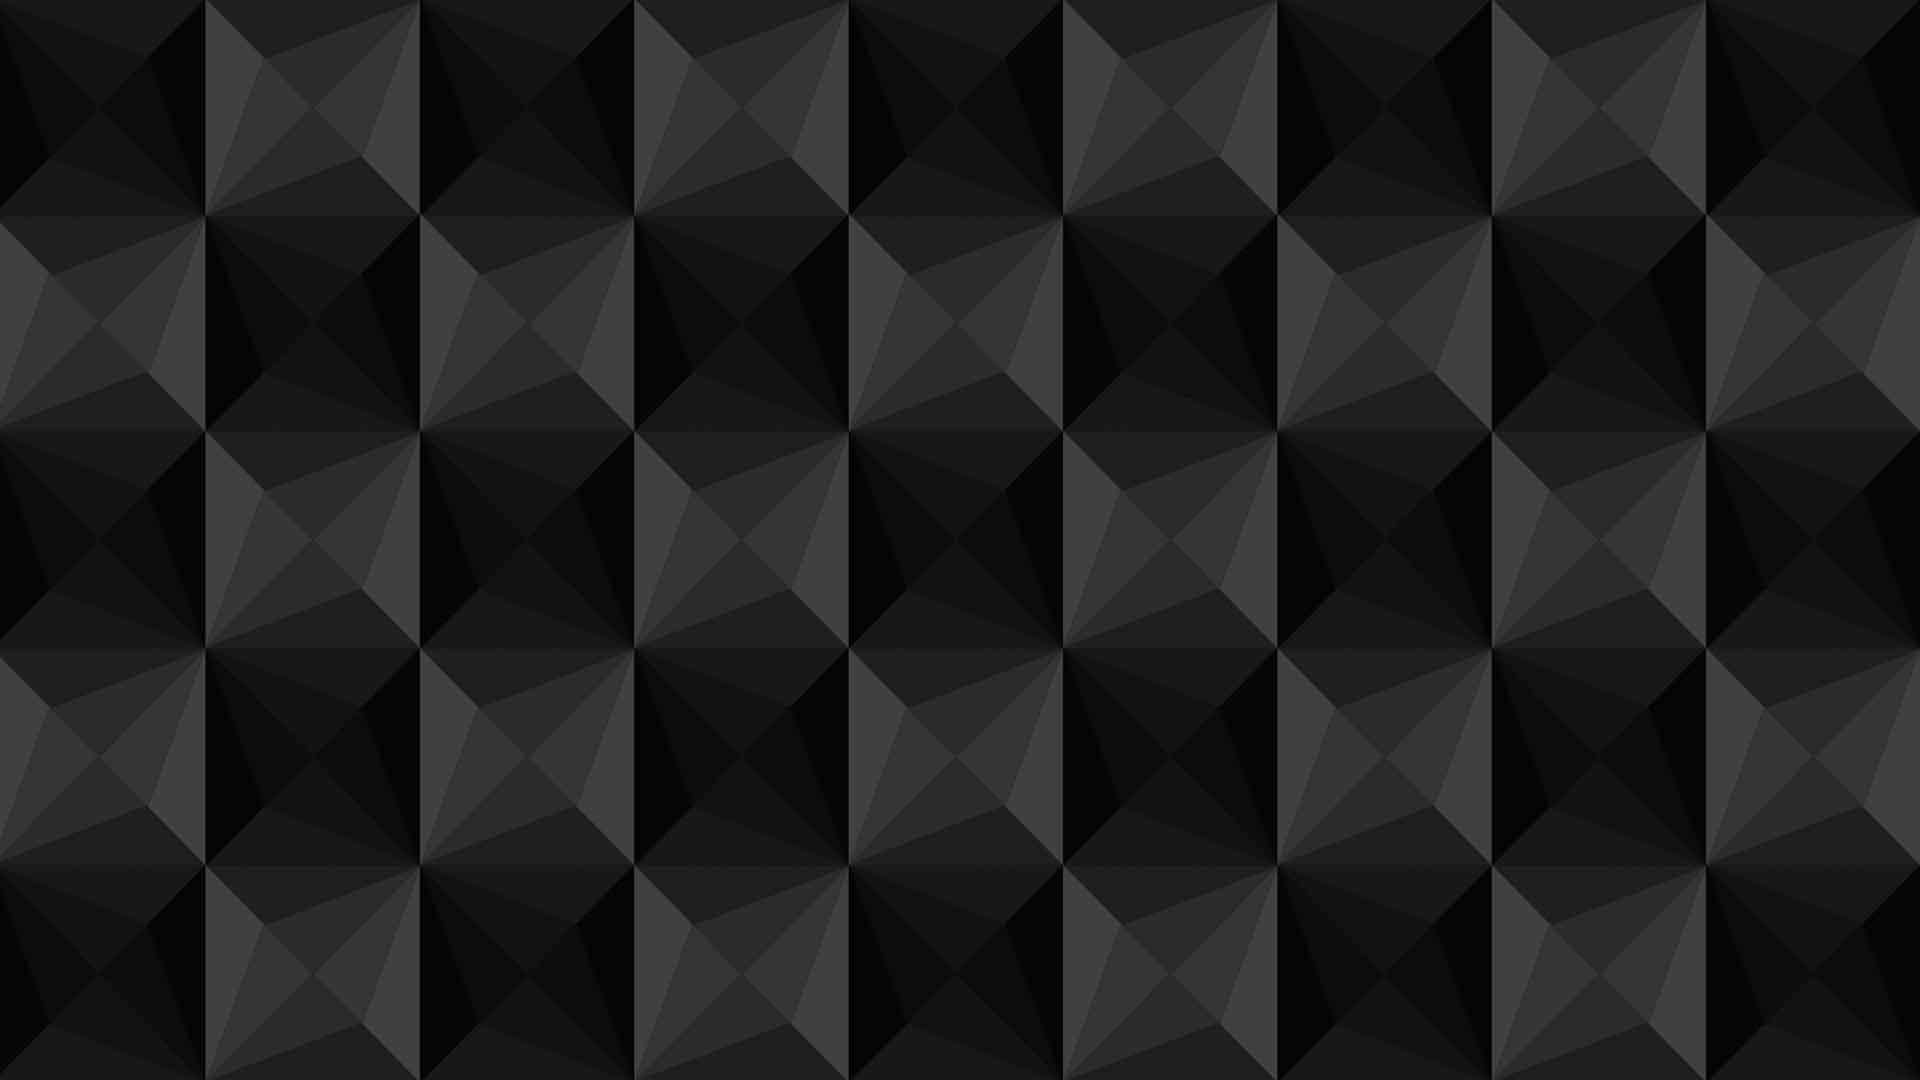 black wallpaper full hd